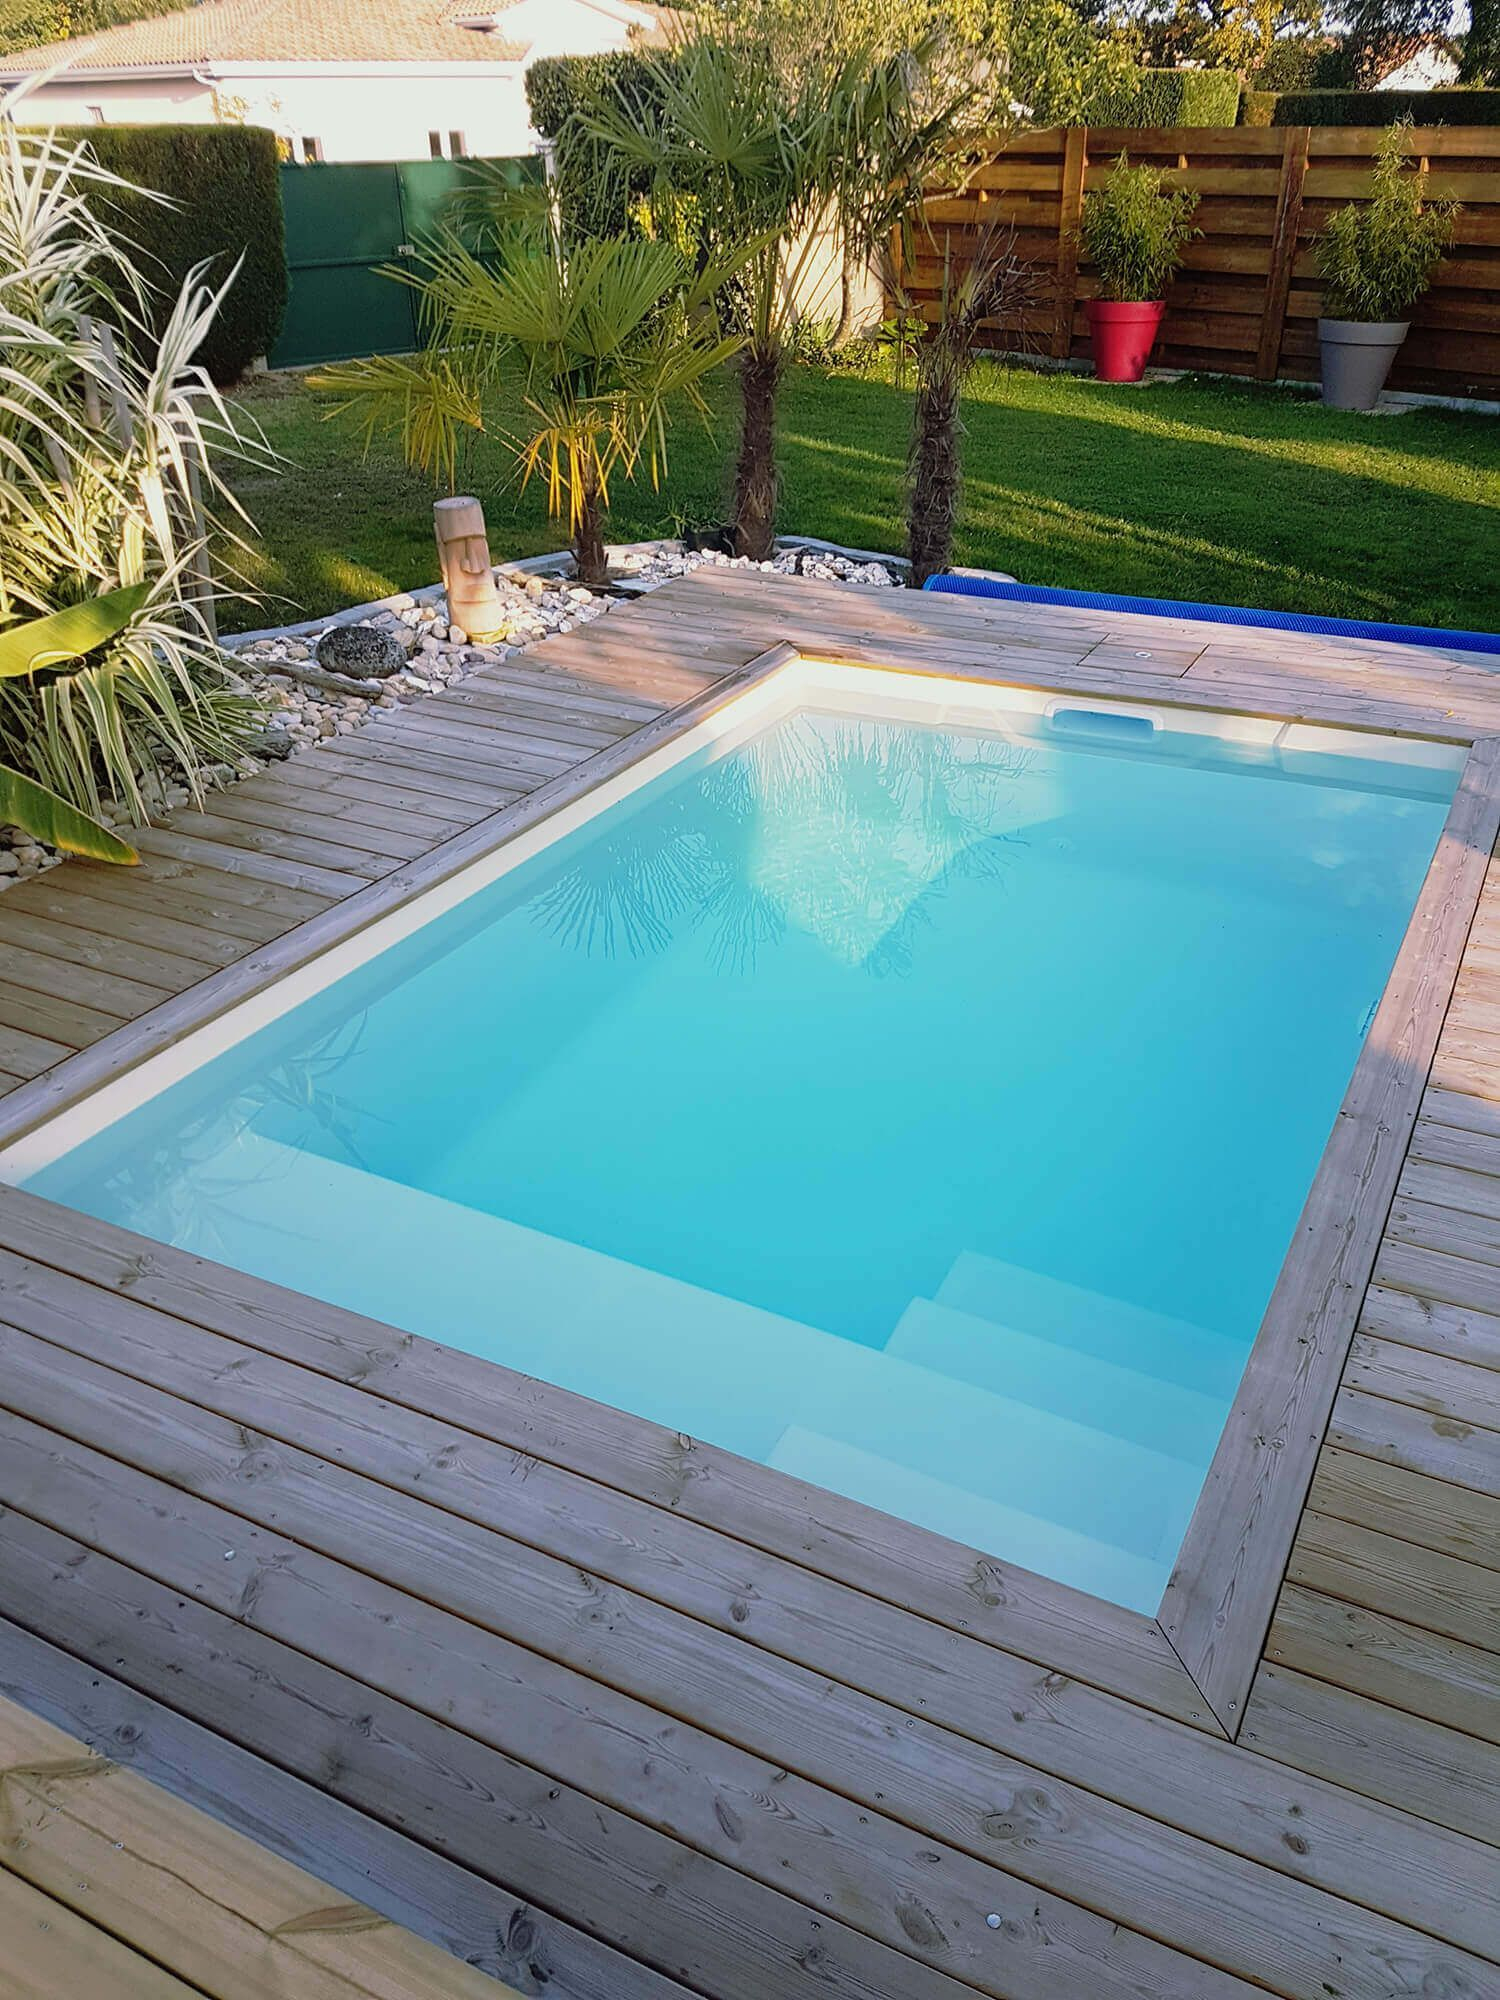 Piscine Fond Plat - Aboral Piscines In 2020 | Small Backyard ... destiné Piscine Aboral